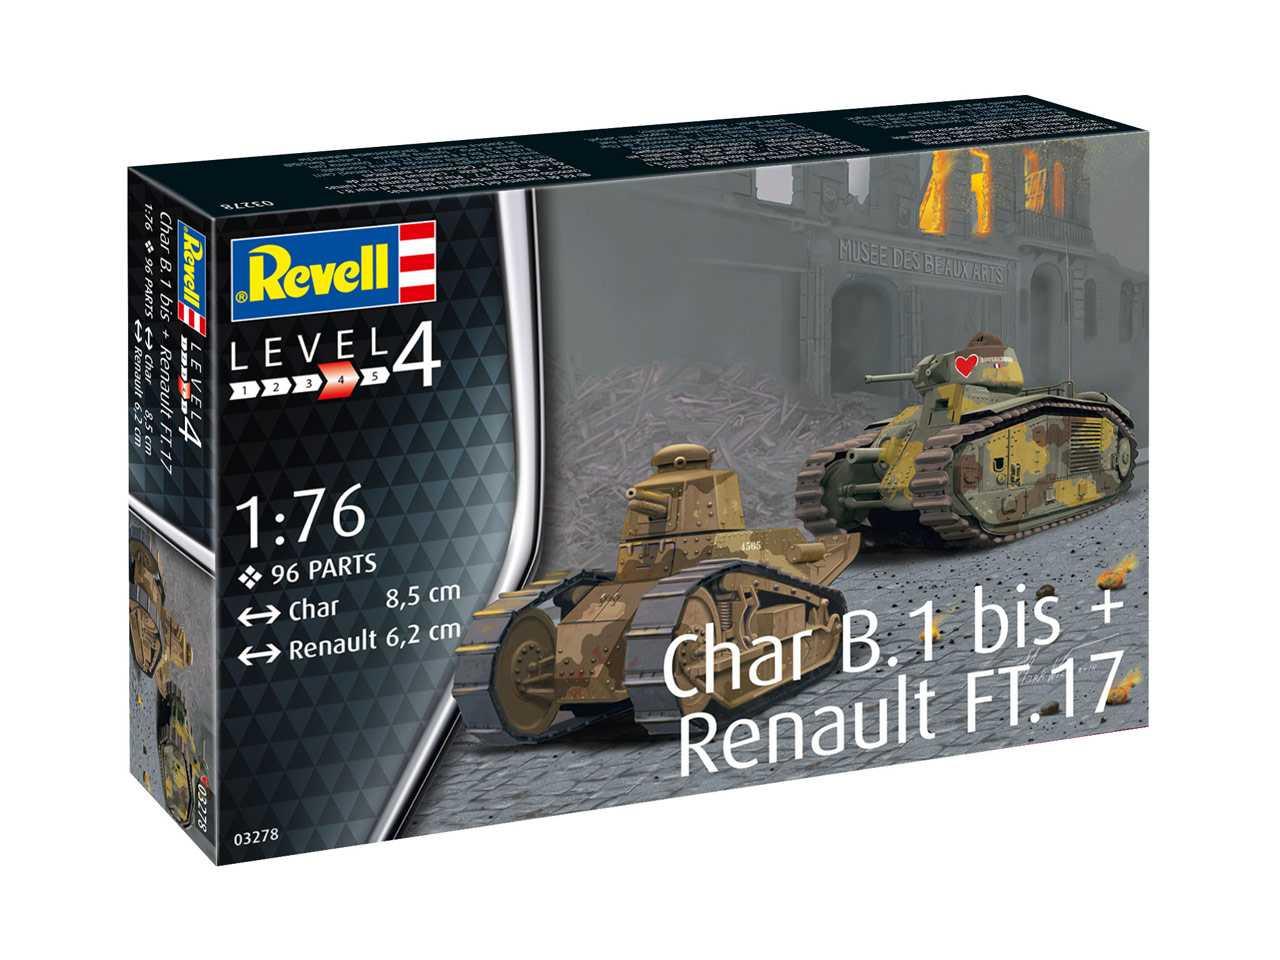 1:76 Char B.1 bis & Renault FT.17